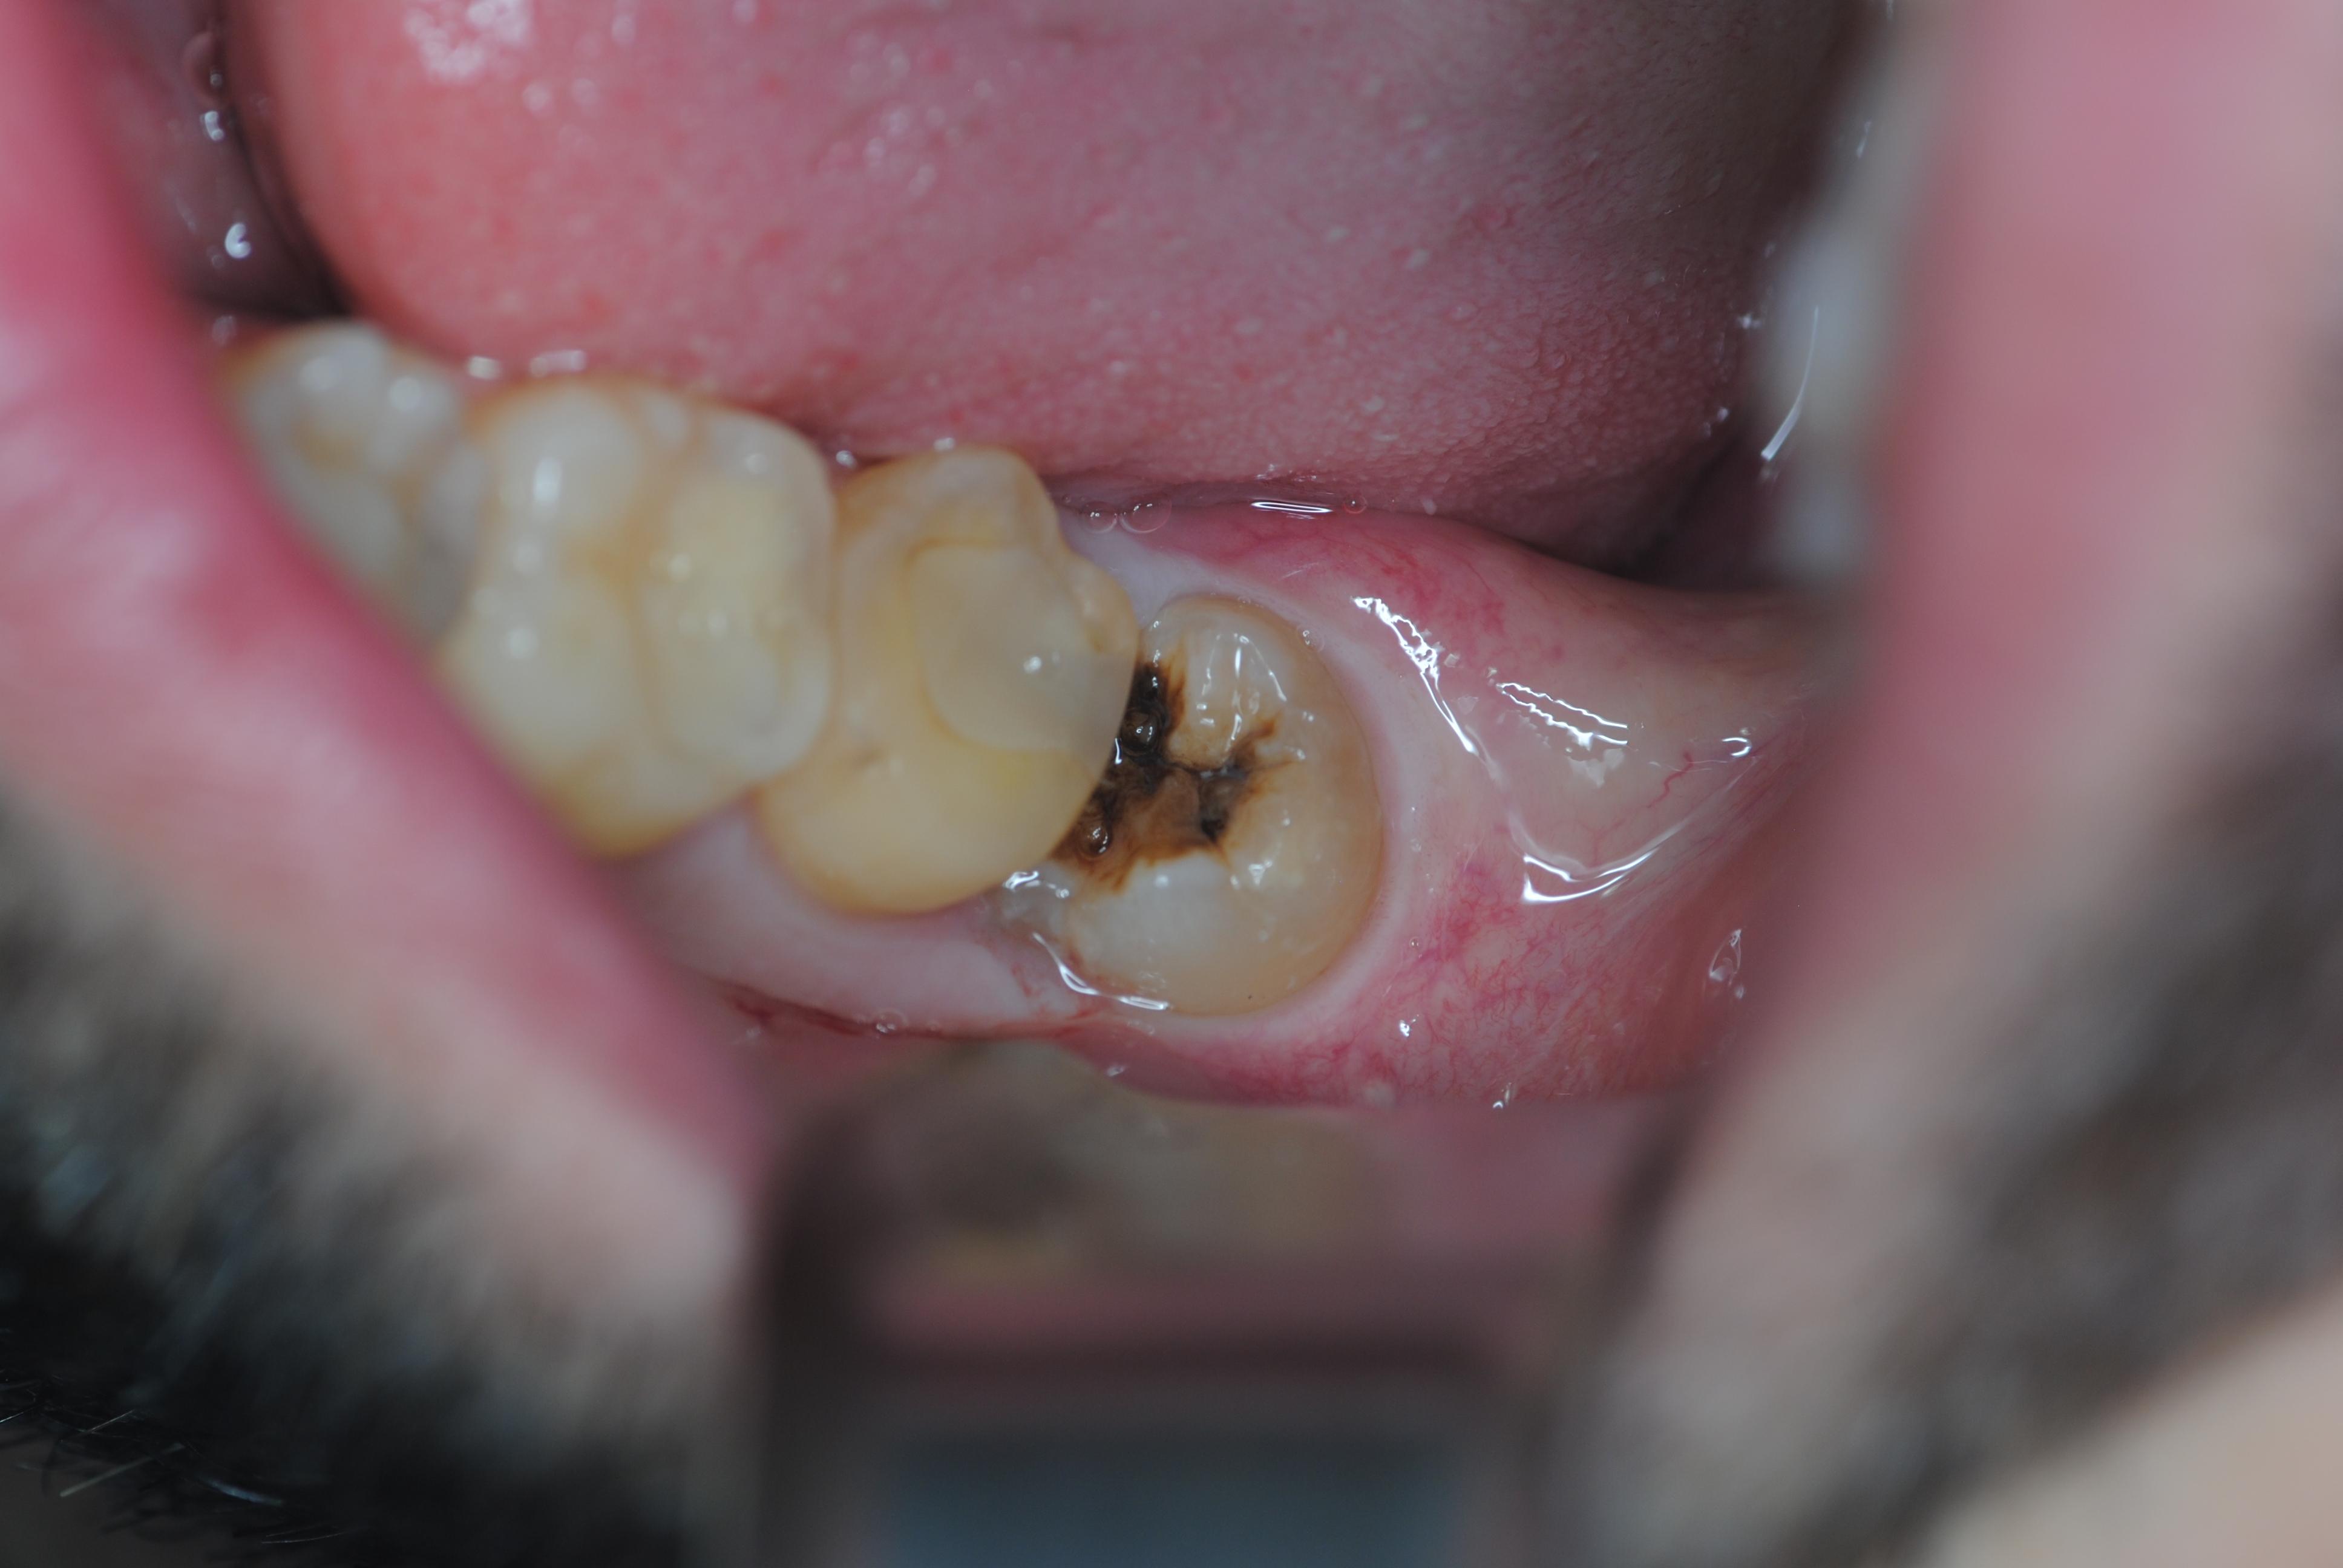 visone occlusale del dente